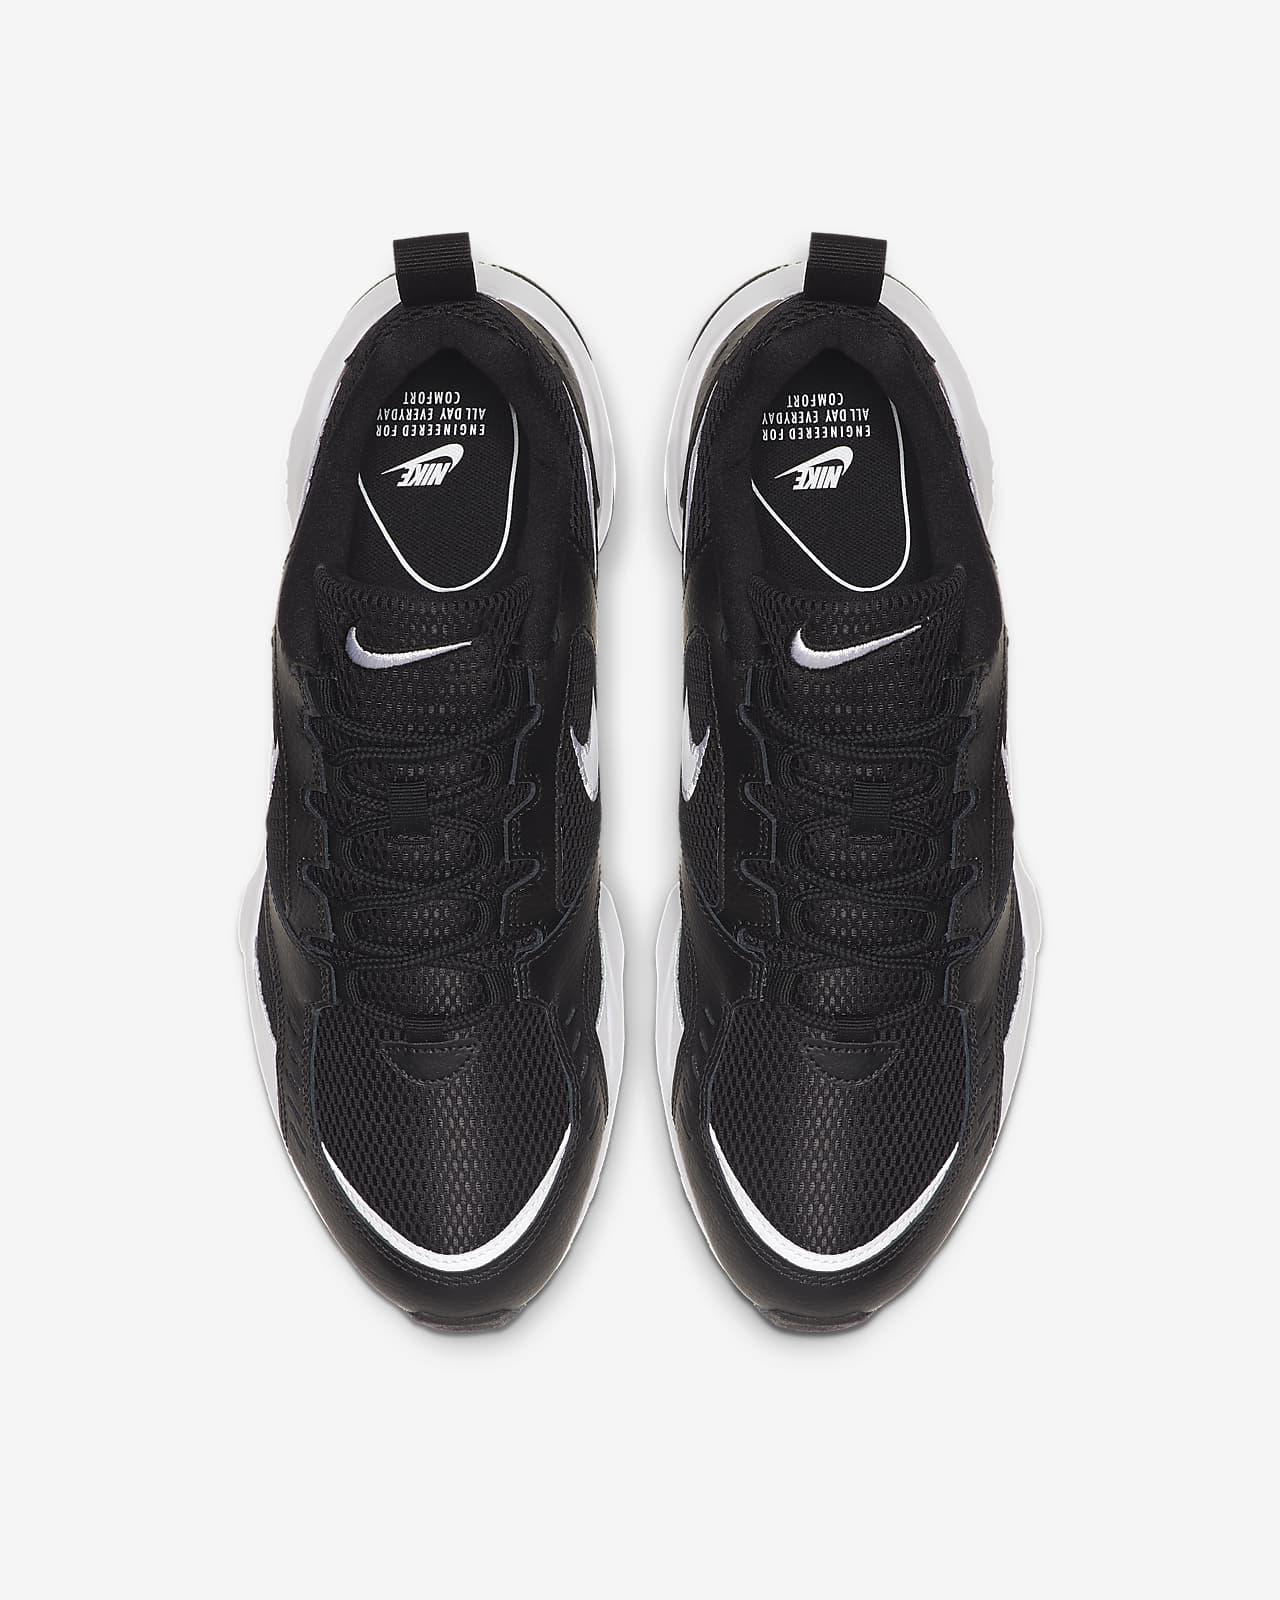 Nike Air Heights Men's Shoe. Nike LU